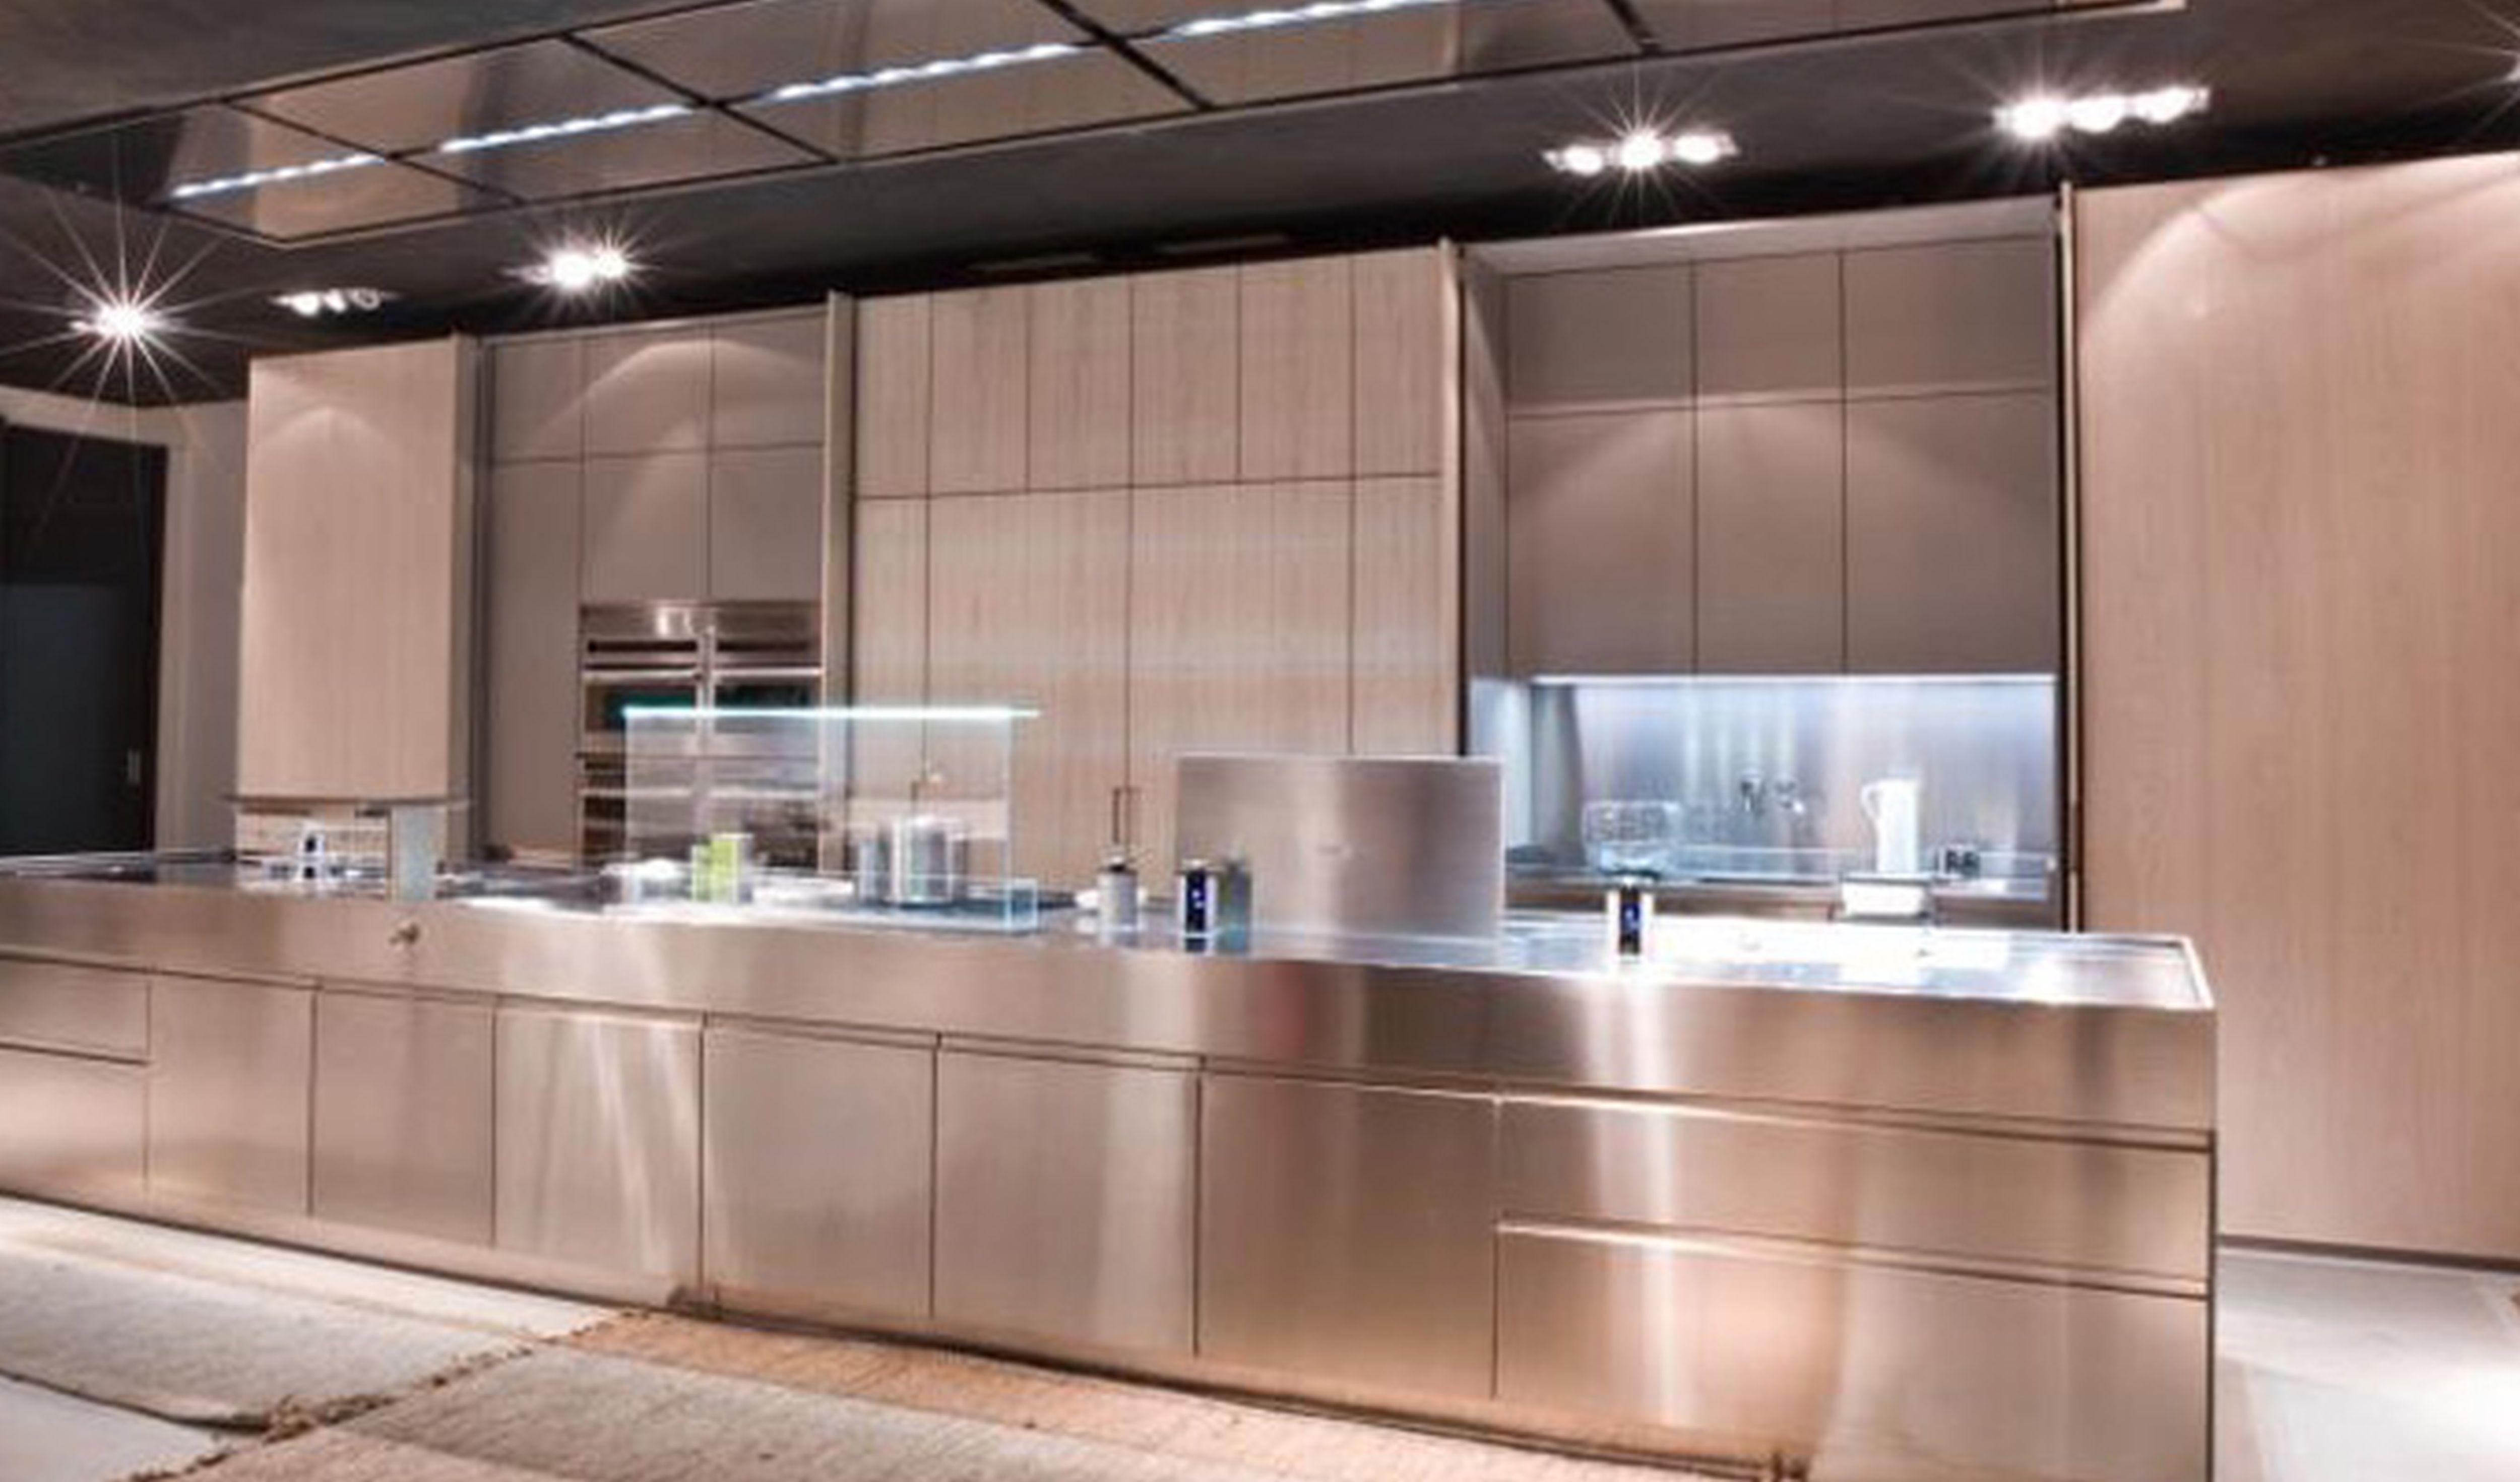 Commercial Kitchen Designer Commercial Kitchen Design And Budget Constraints Brisbane Business